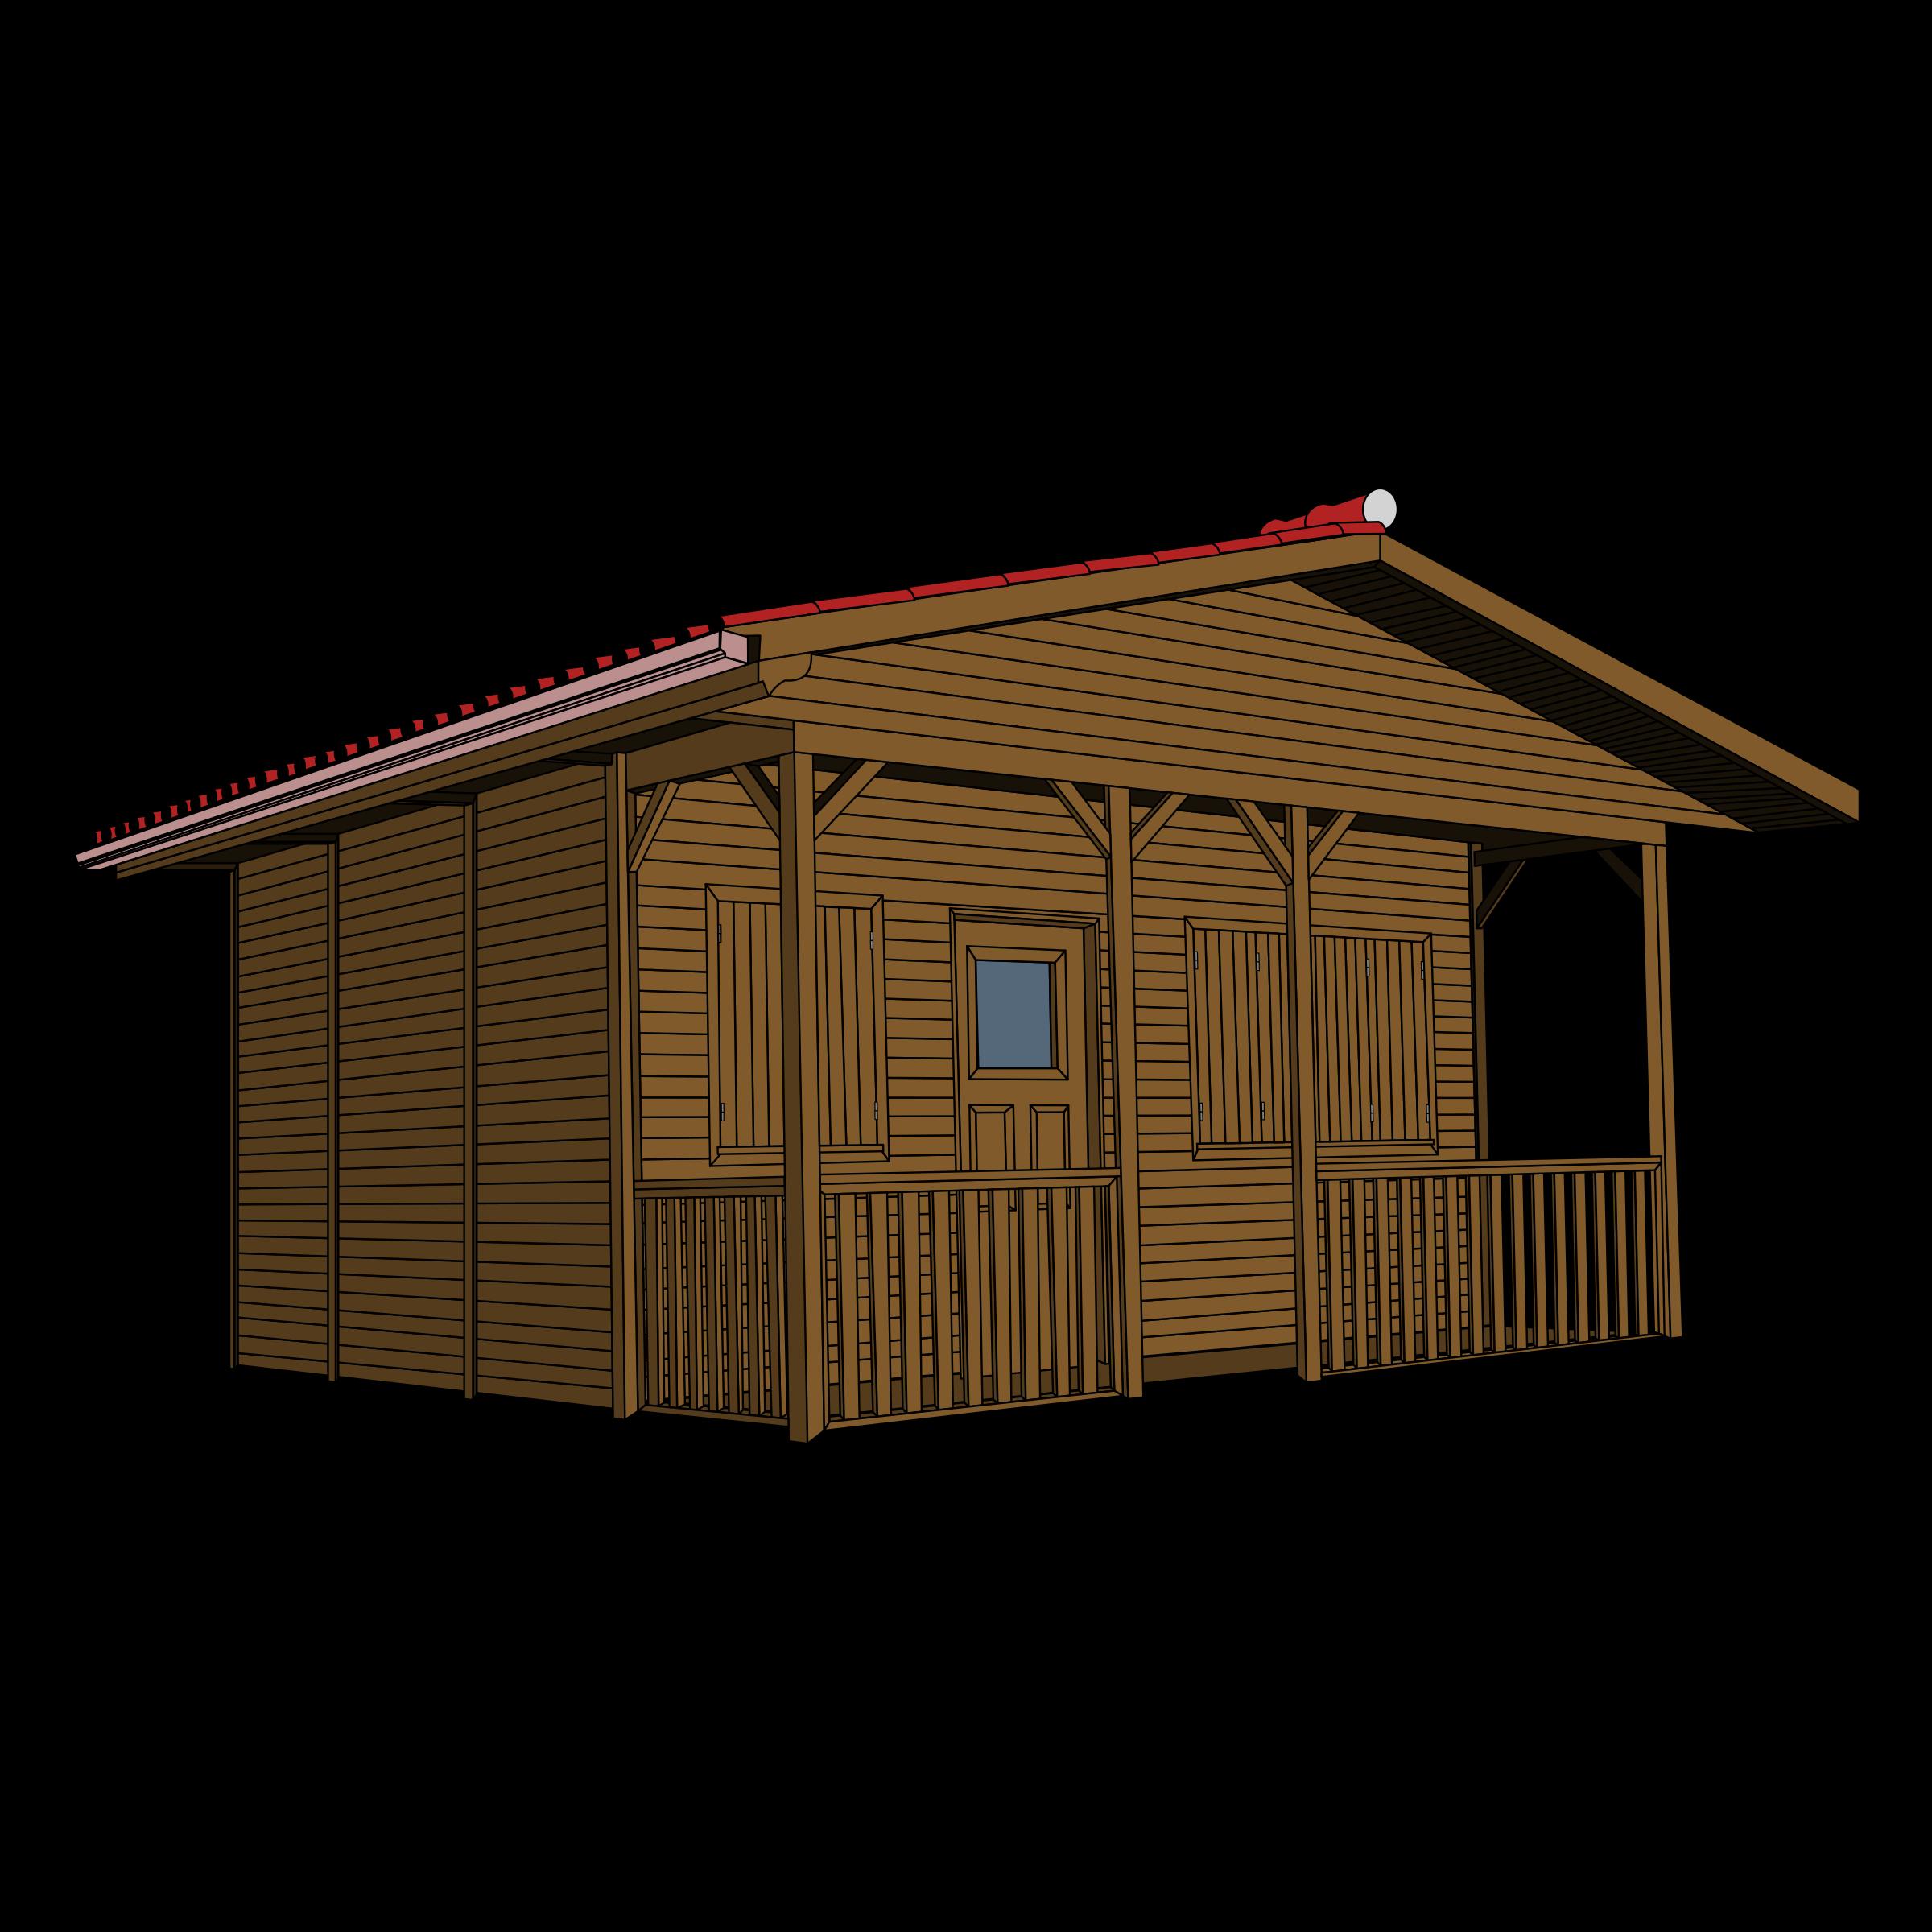 2400x2400 Hut Clipart Wooden House